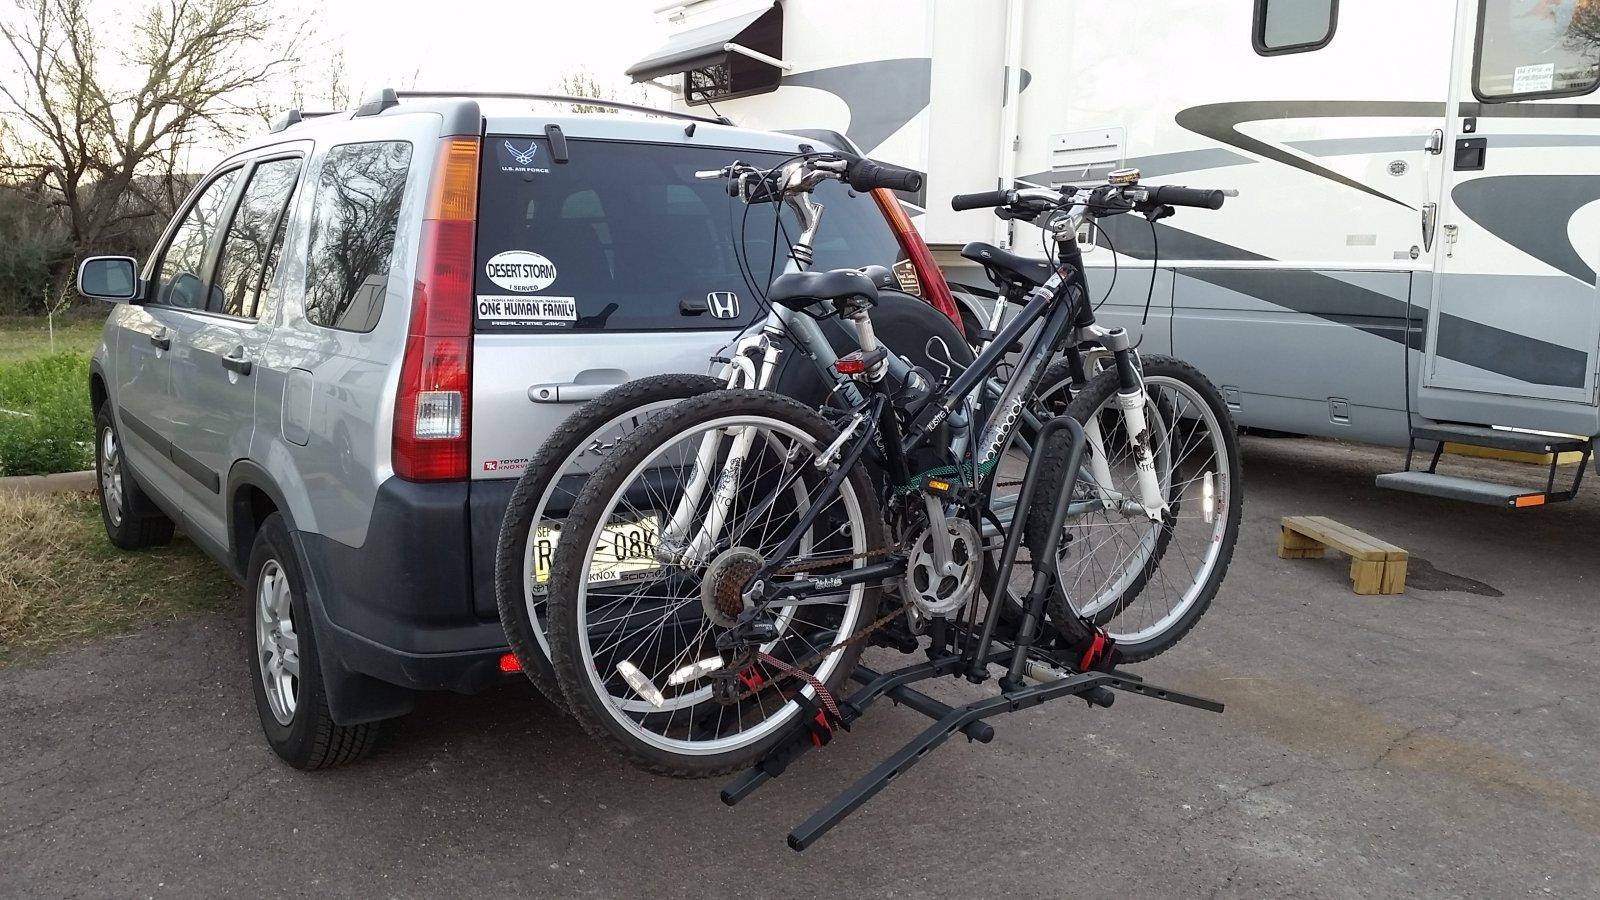 gr beta review spice dsc reviewed bike clothes kuat mount bikes nv rack black sherpa hitch aerogeeks